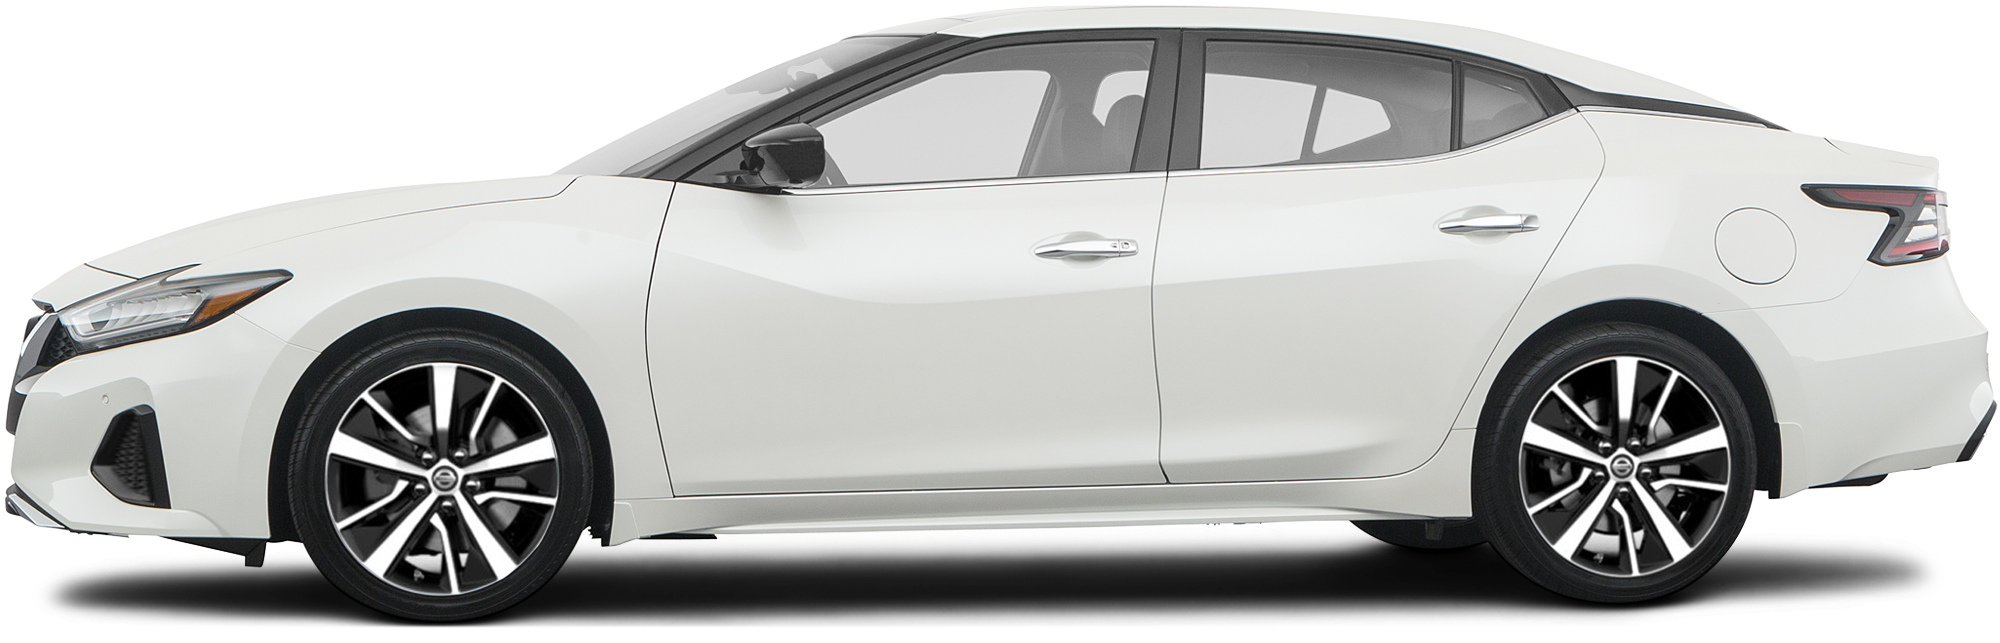 2020 Nissan Maxima Sedan 3.5 S